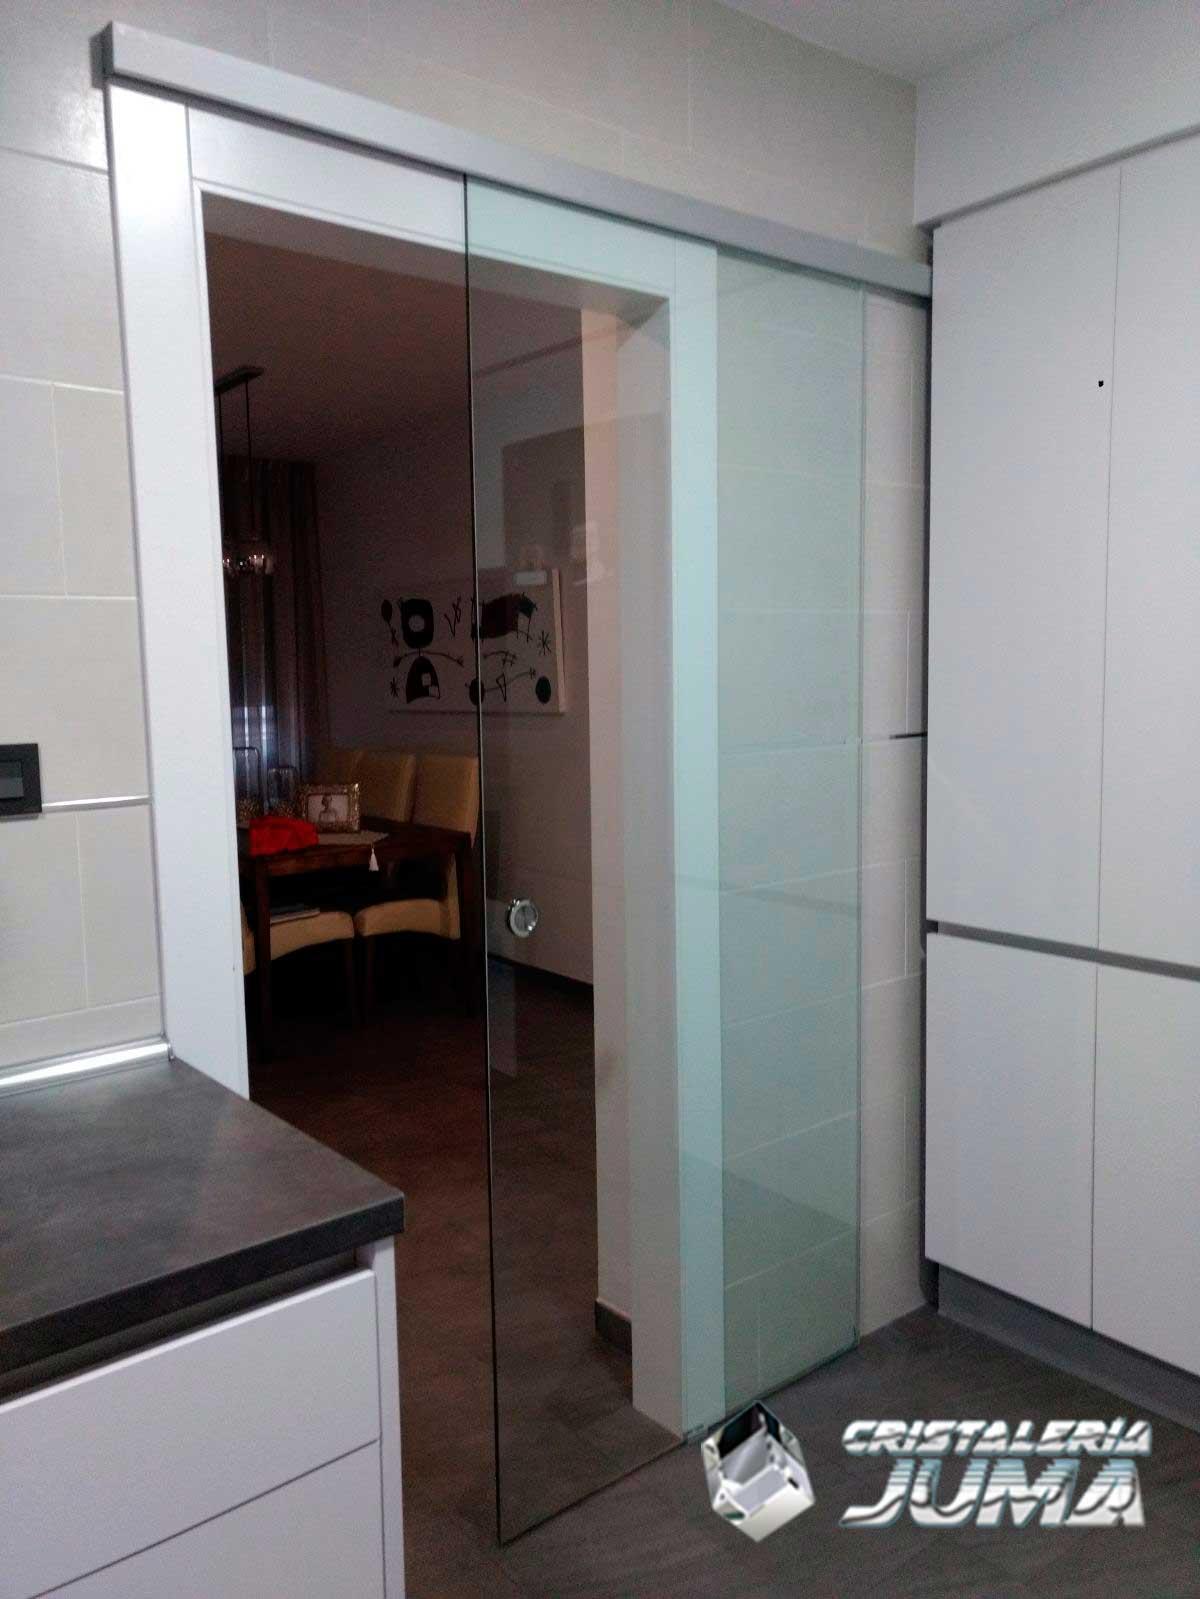 Puertas De Cristal Cristaler A Juma ~ Cristales Decorados Para Cocinas